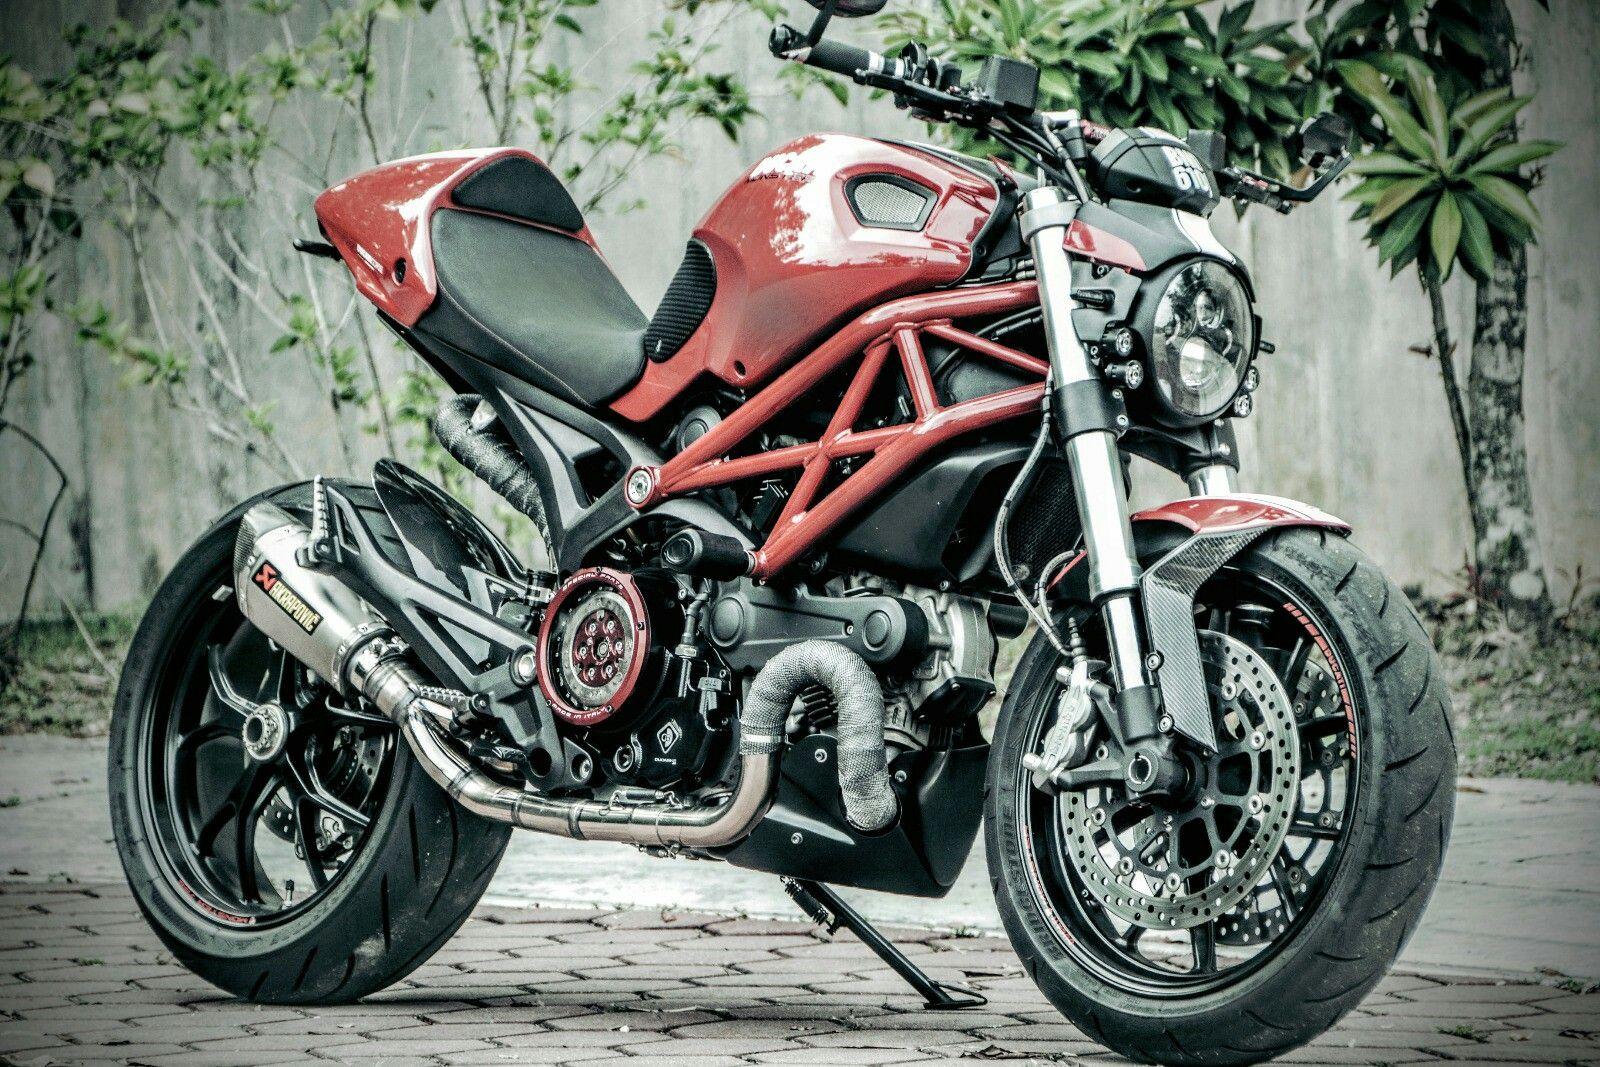 a custom ducati monster 796 project bikes bikes biiiiikes pinterest ruedas. Black Bedroom Furniture Sets. Home Design Ideas